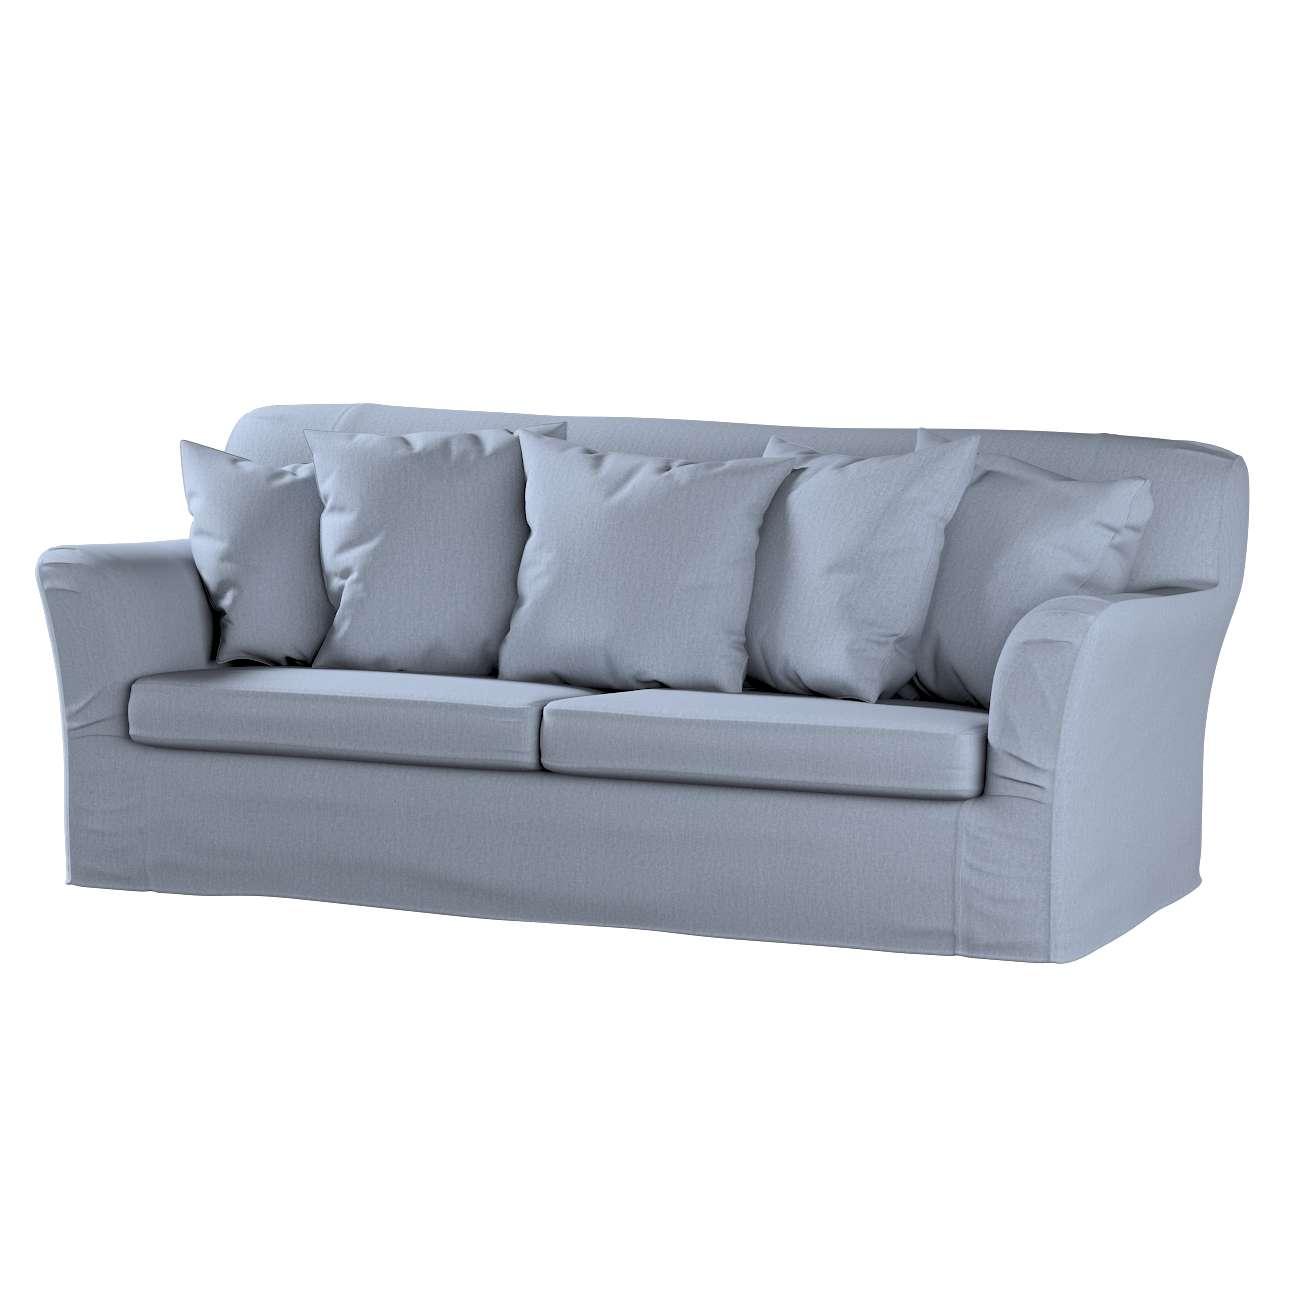 Blauwe Ikea Slaapbank.Ikea Zitbankhoes Overtrek Voor Tomelilla Slaapbank Zilver Blauw